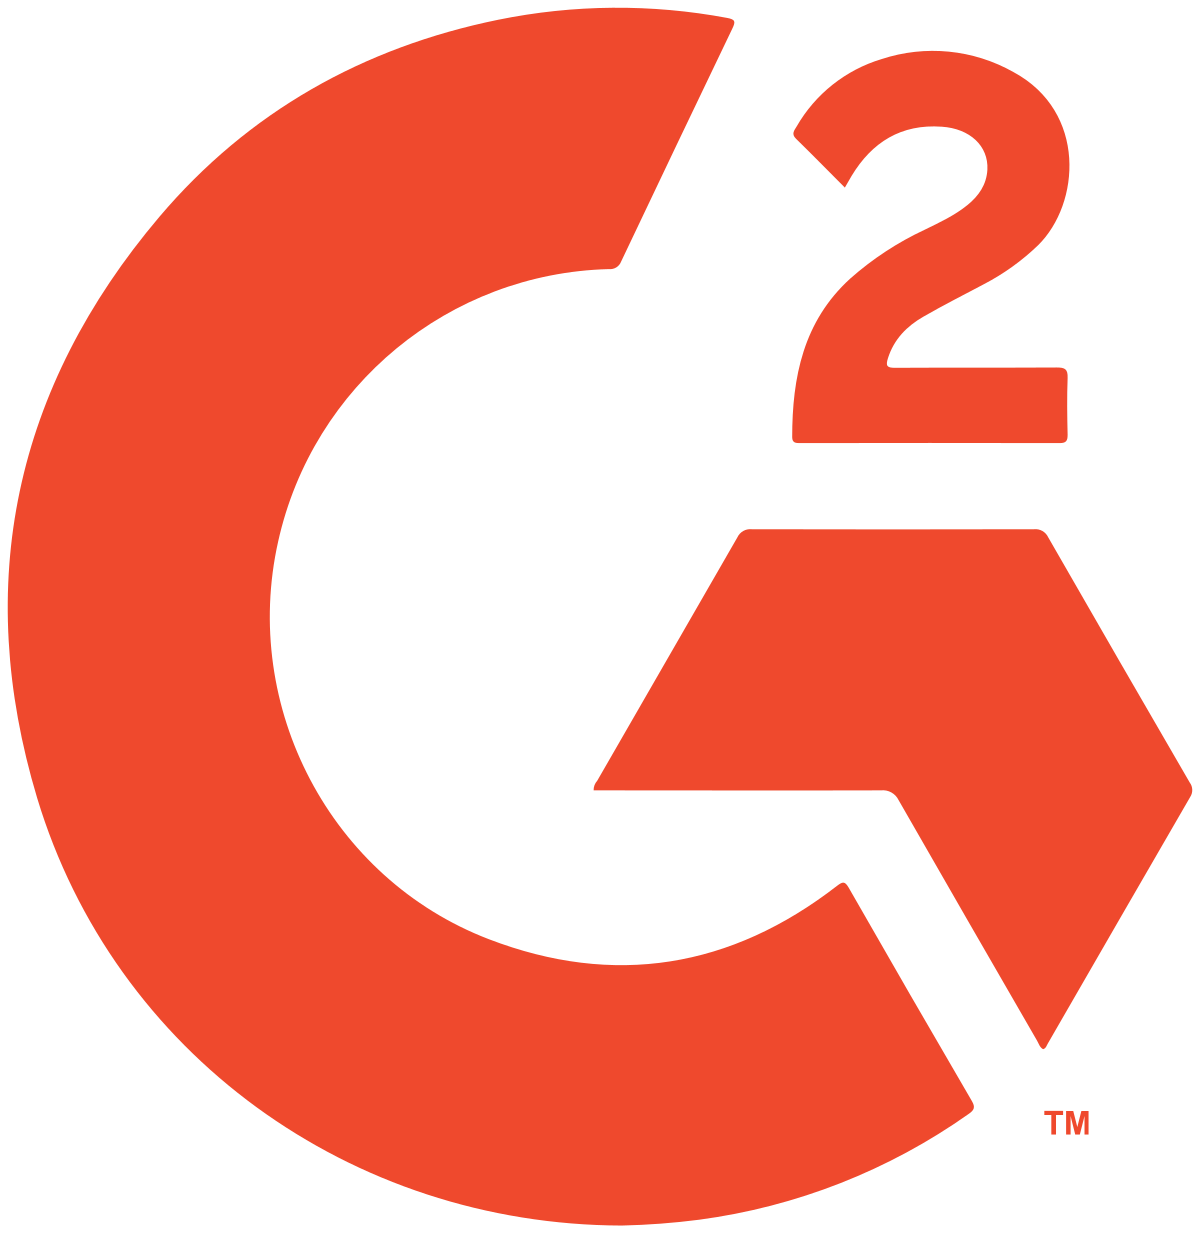 G2 logo color